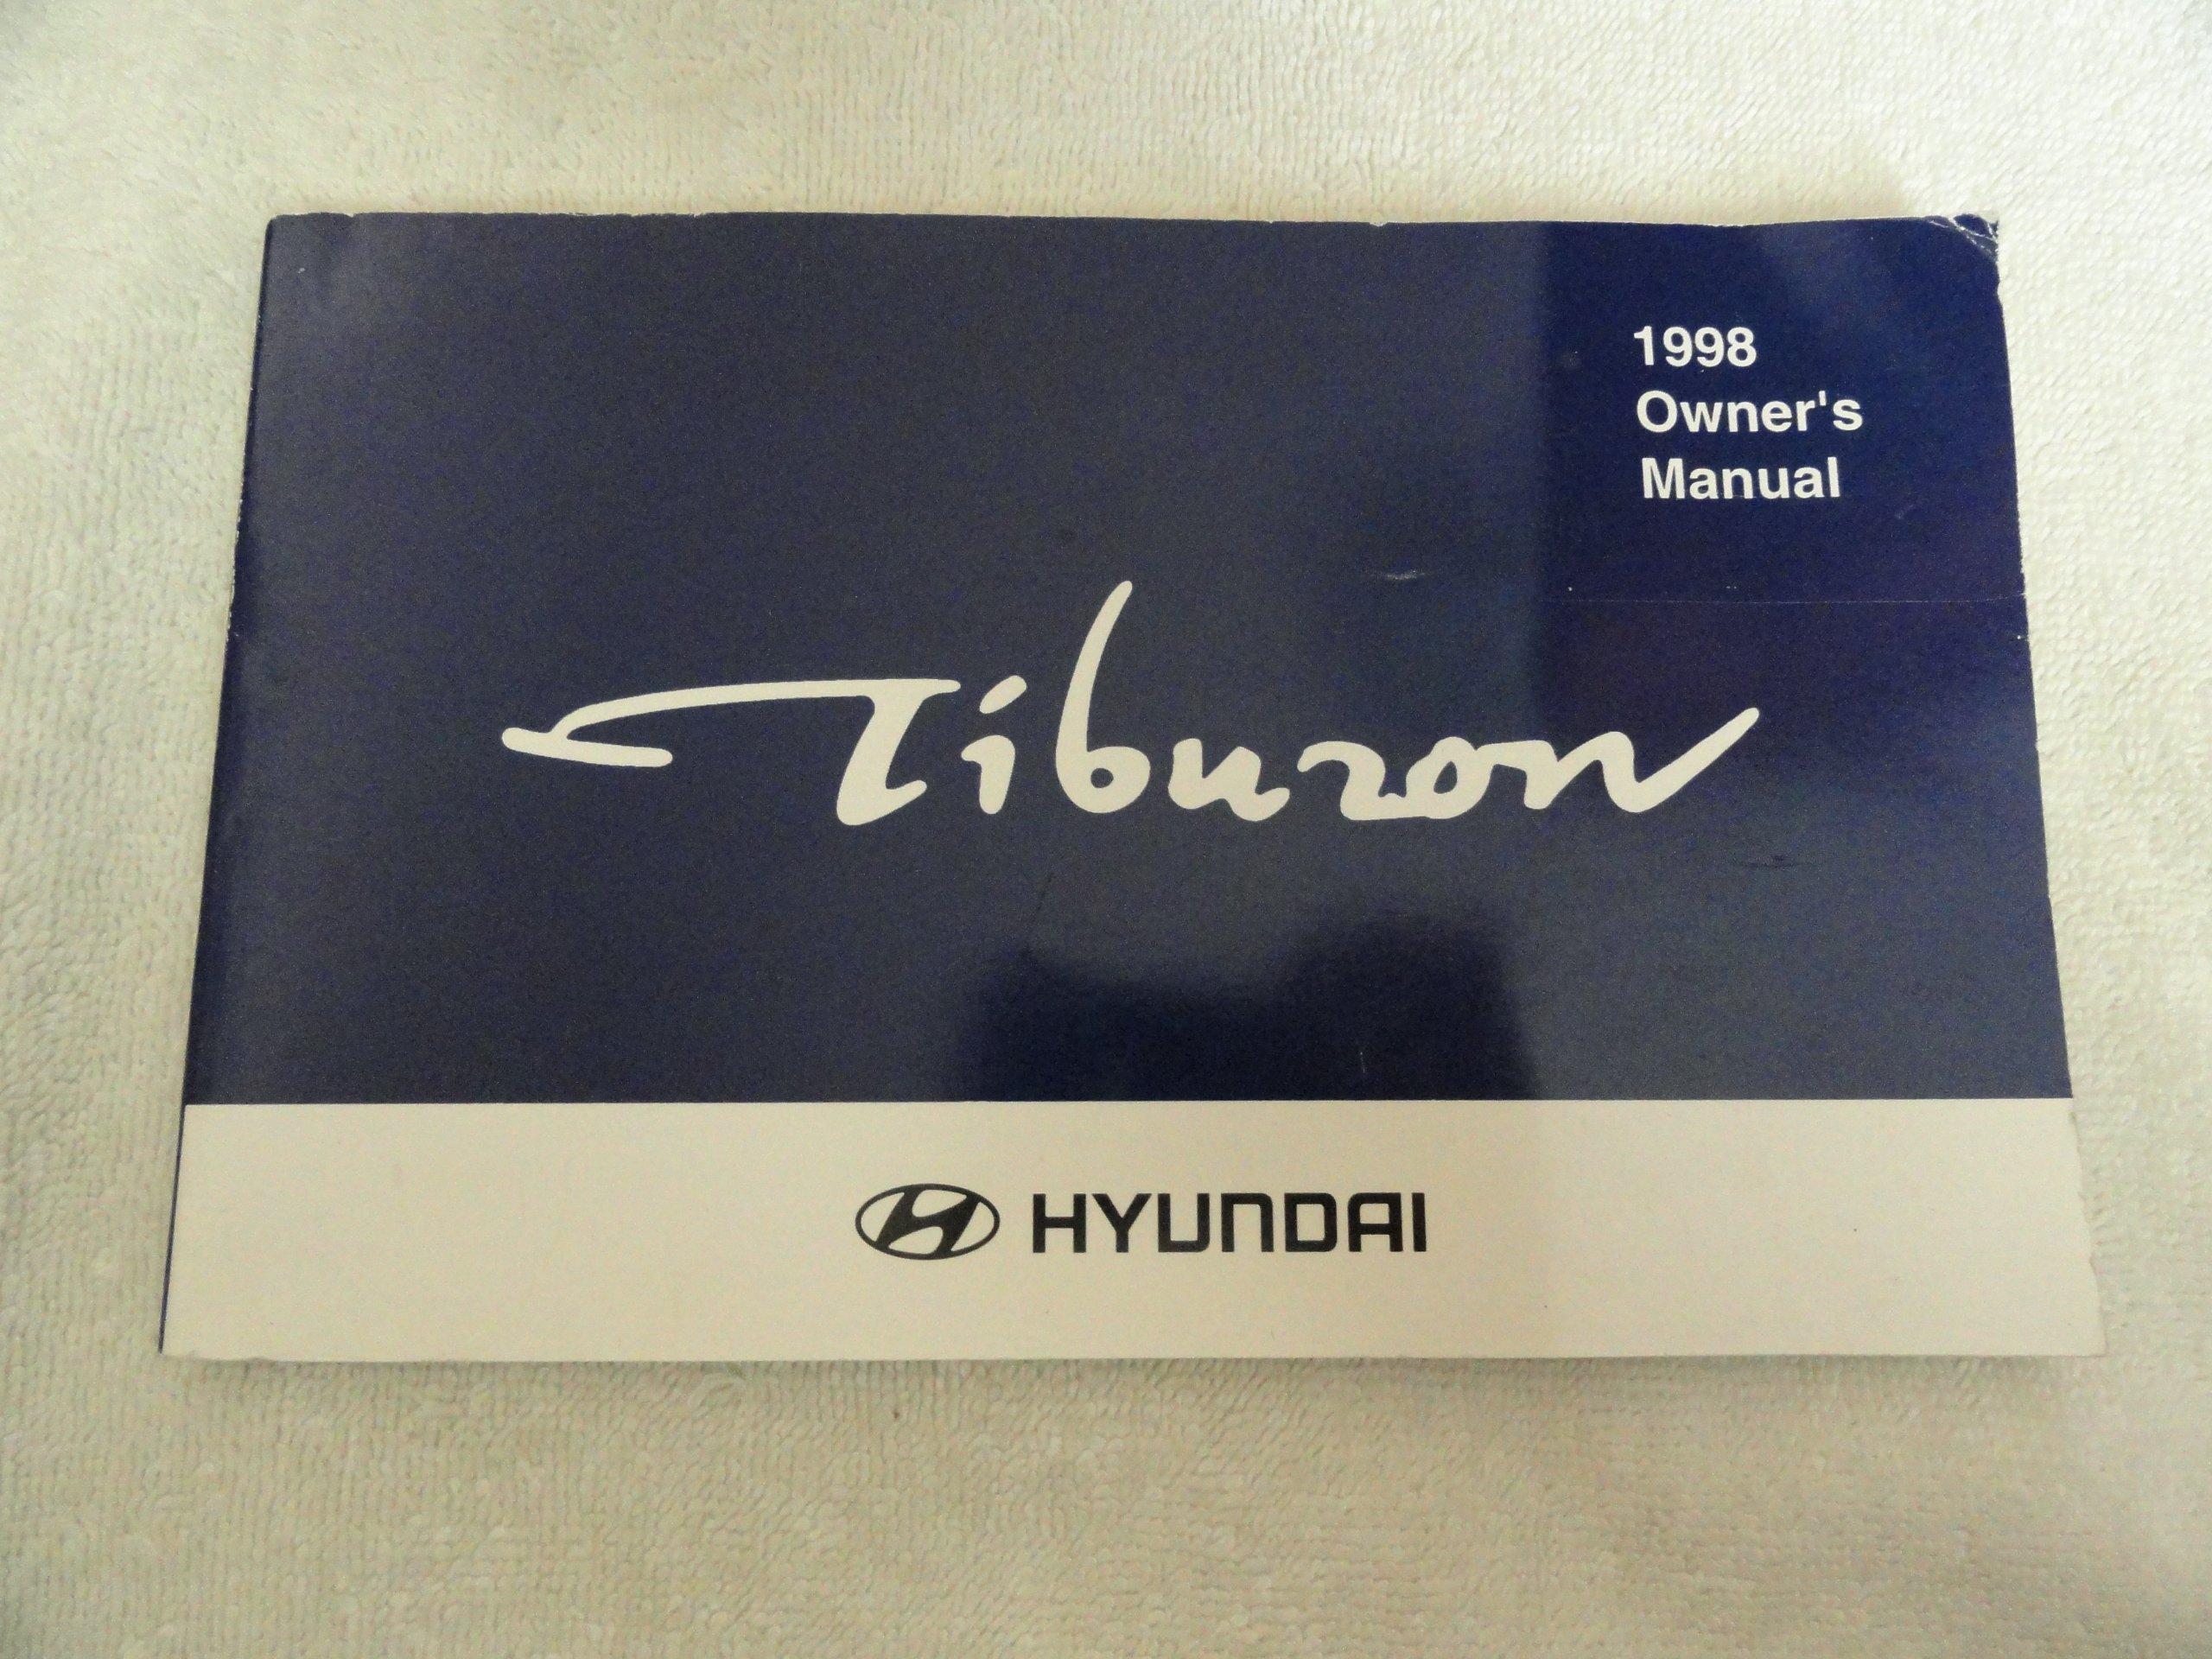 1998 hyundai tiburon owners manual hyundai amazon com books rh amazon com 2004 Hyundai Tiburon 2004 Hyundai Tiburon